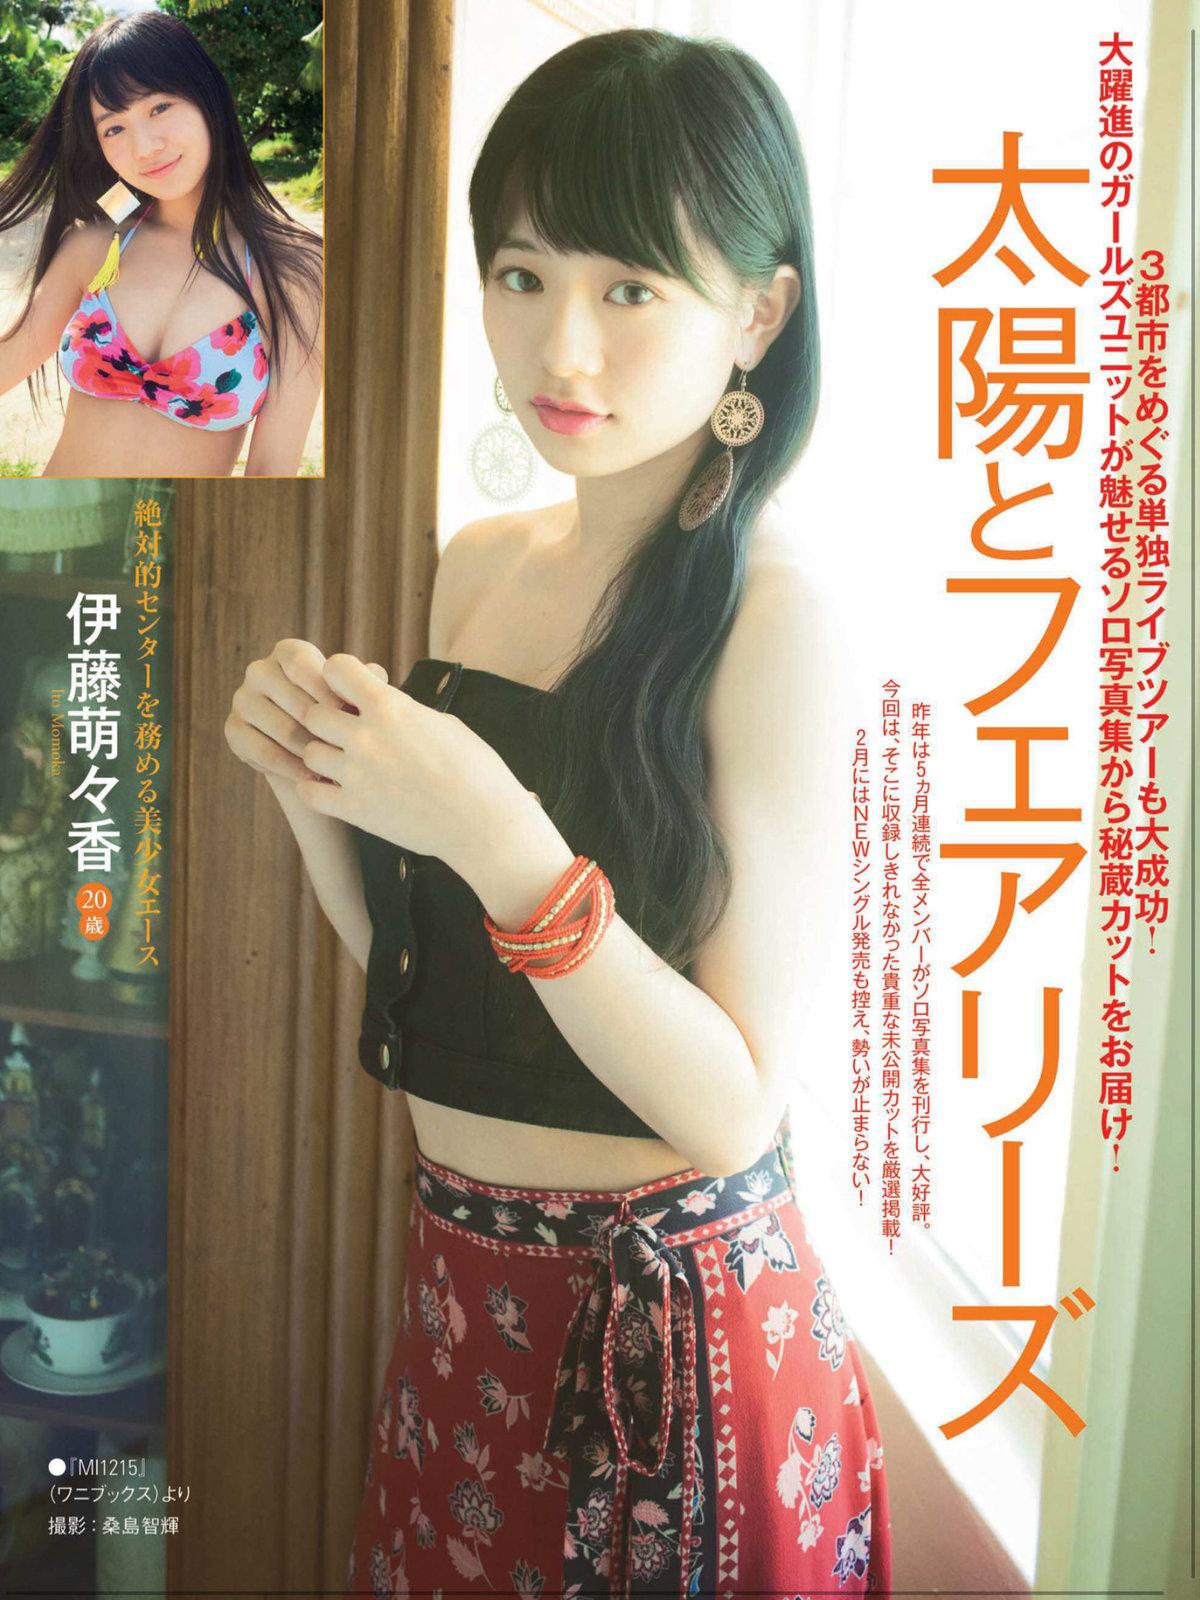 Bikini, Fairies (フェアリーズ), FRIDAY magazine, Magazine